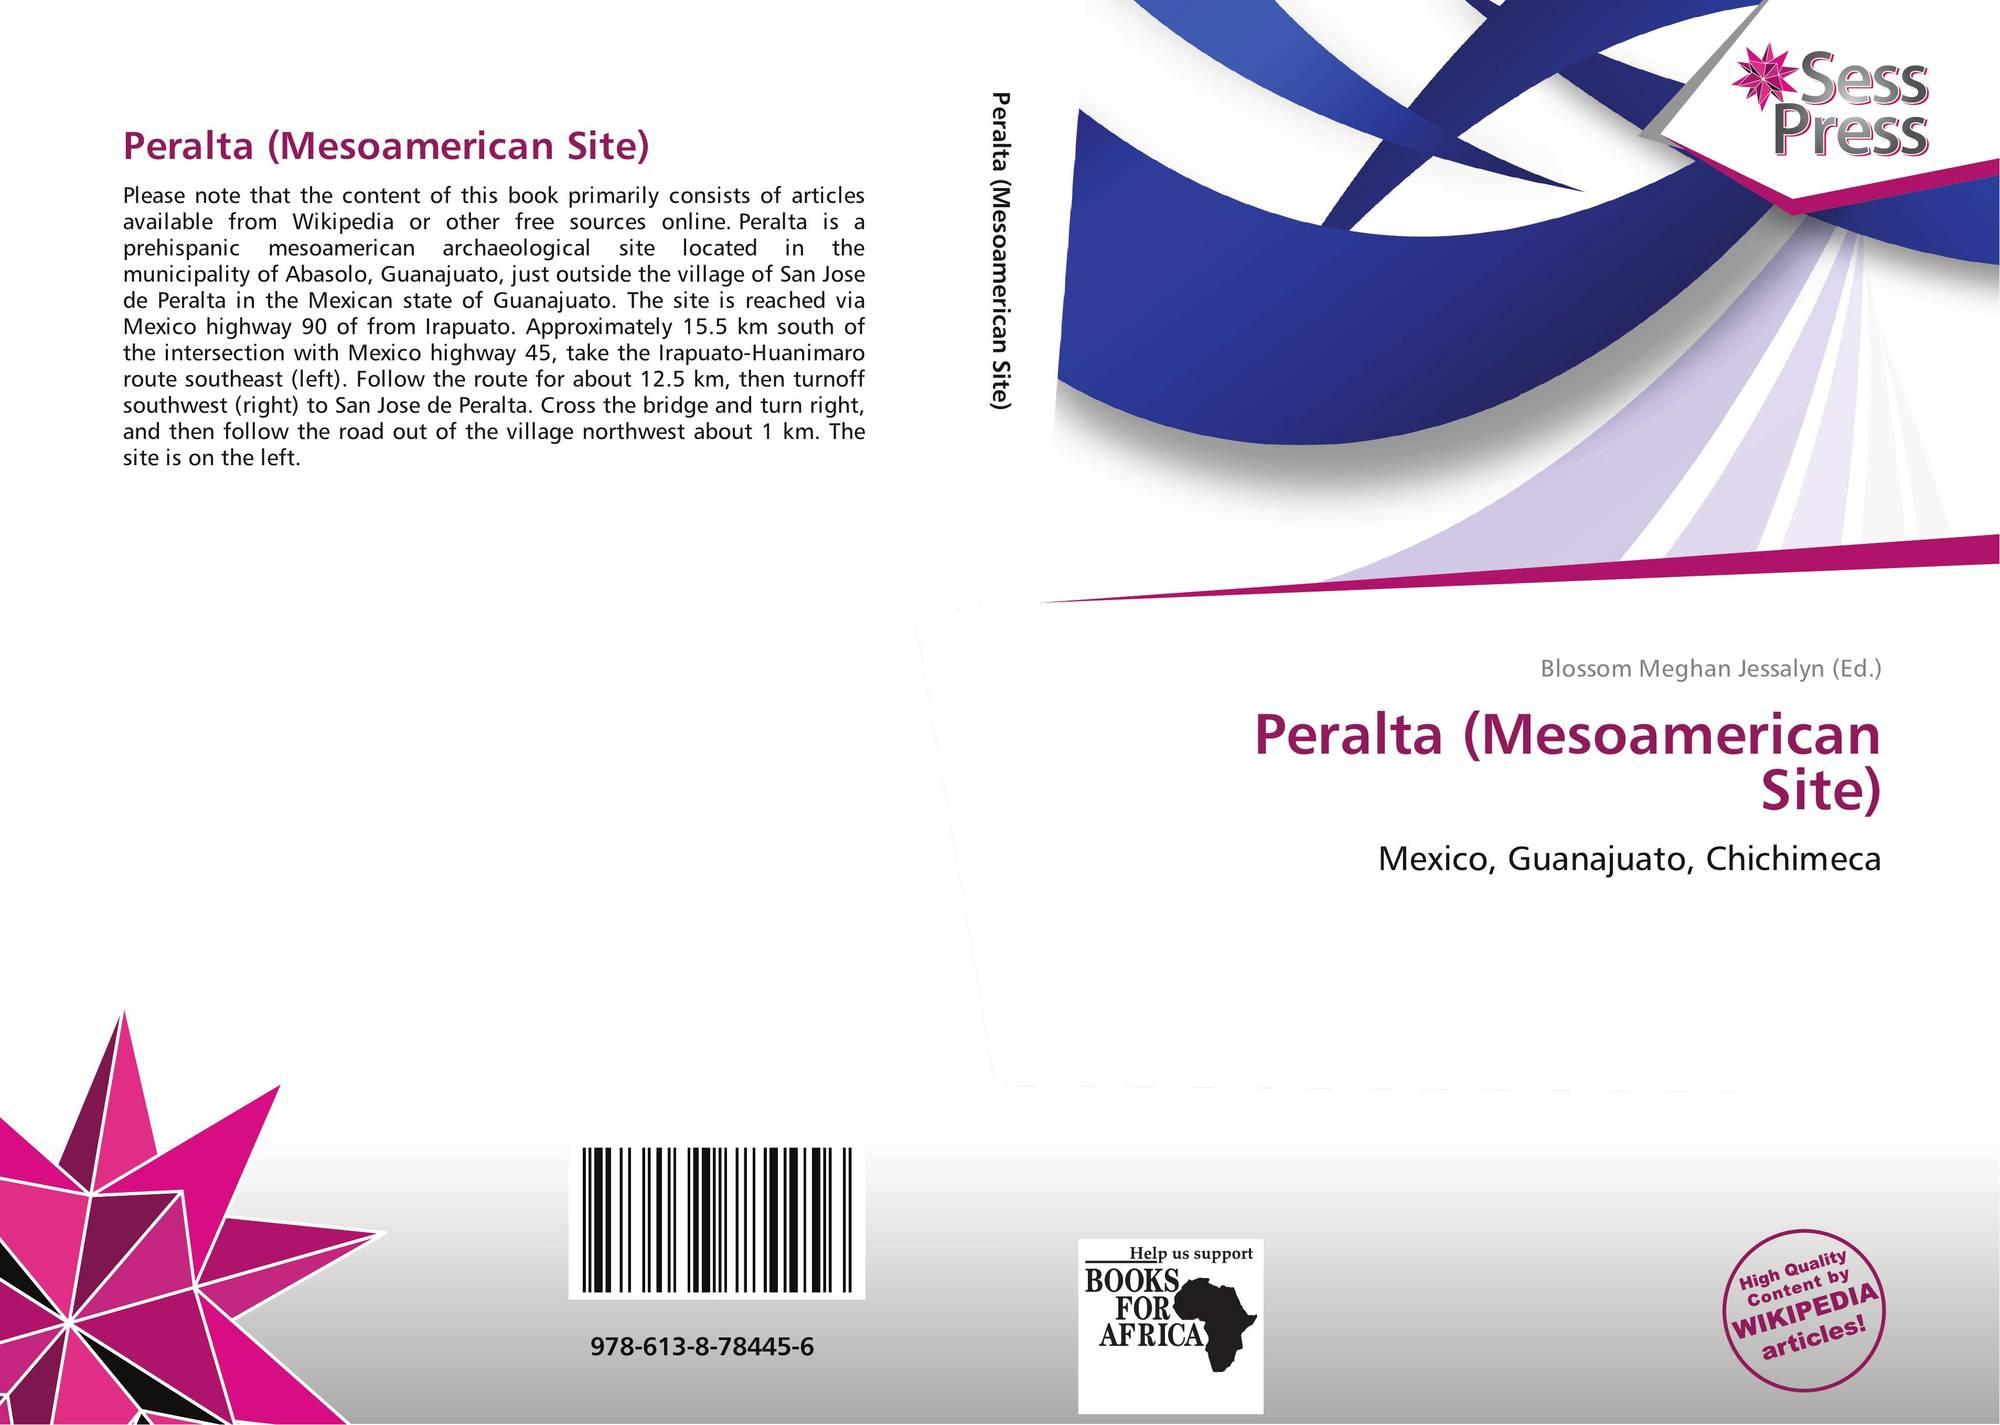 Peralta Mesoamerican Site 978 613 8 78445 6 6138784456